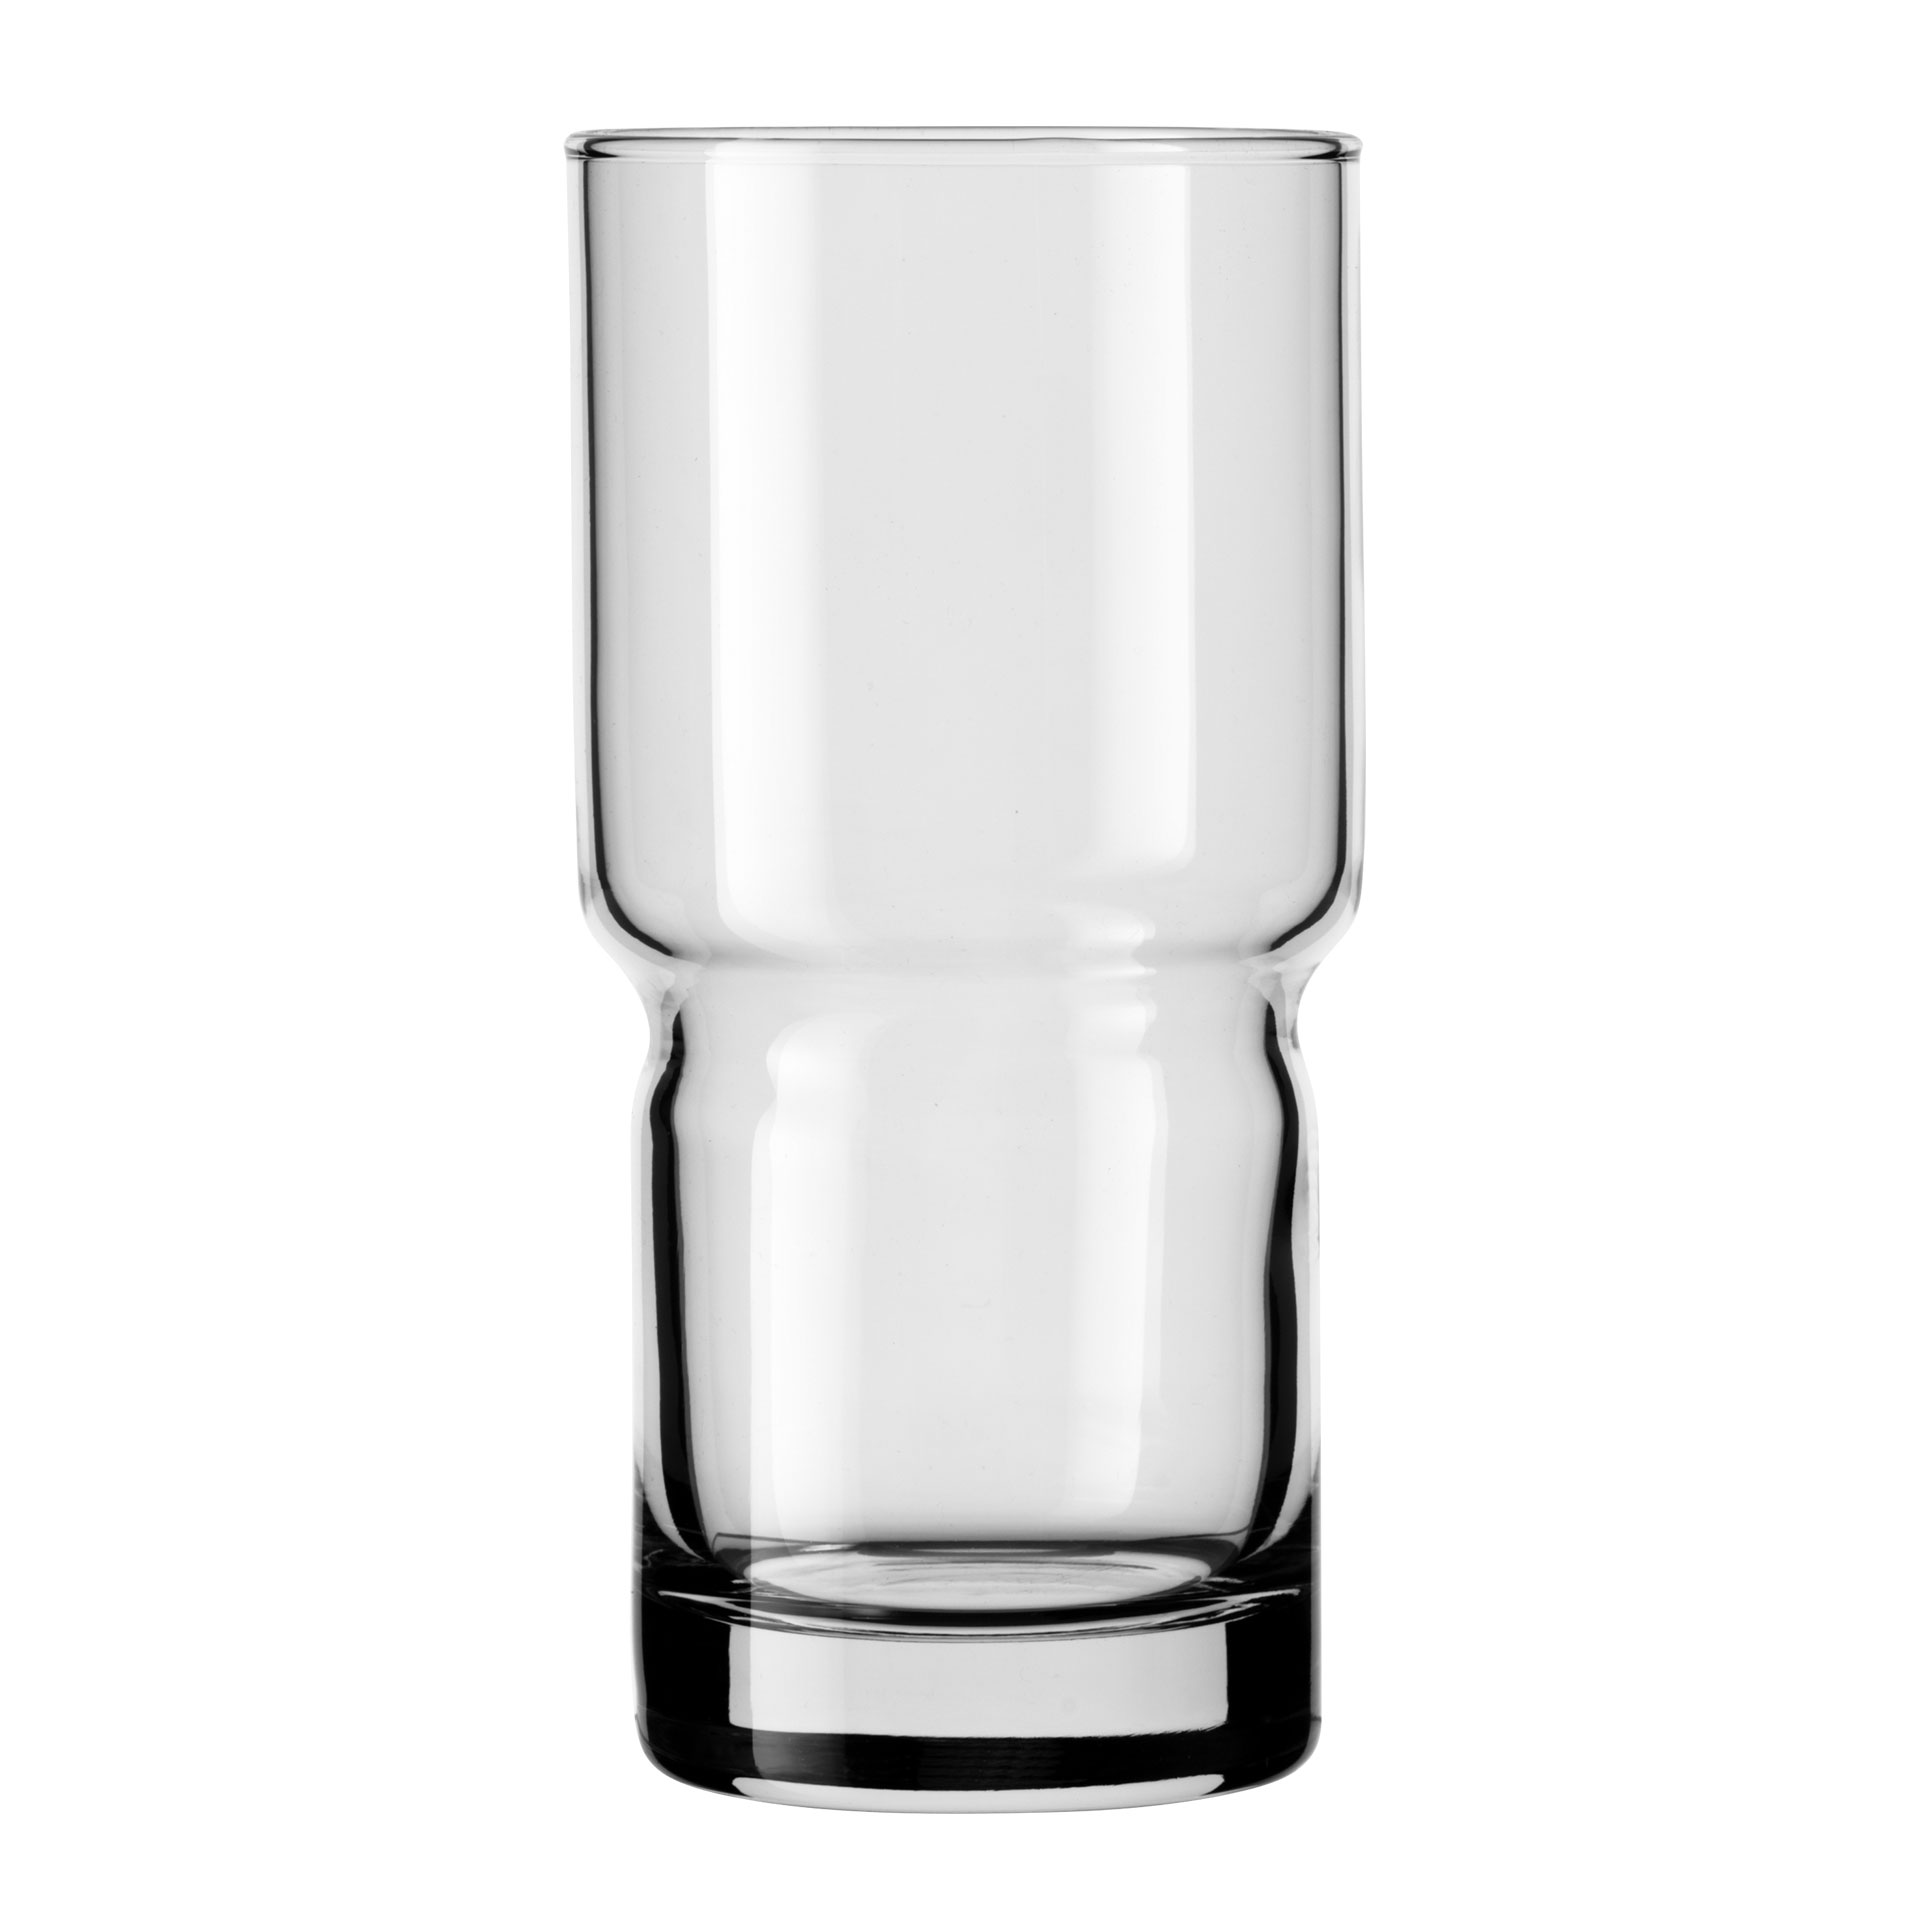 Libbey Glass 12039 glass, water / tumbler